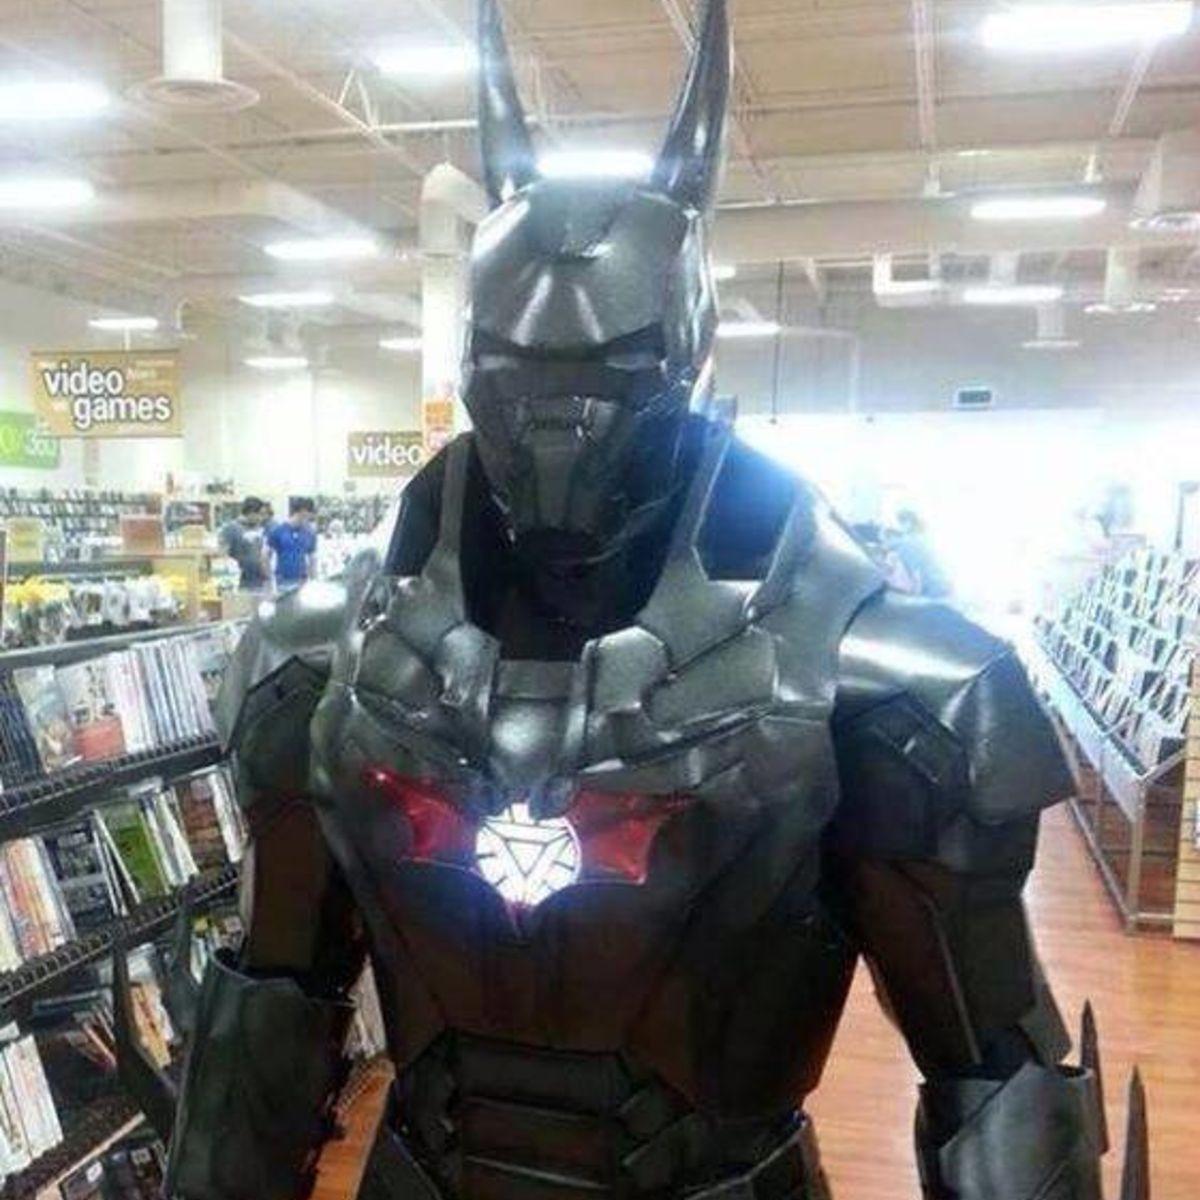 iron-man-and-batman-mashup-cosplay.jpg